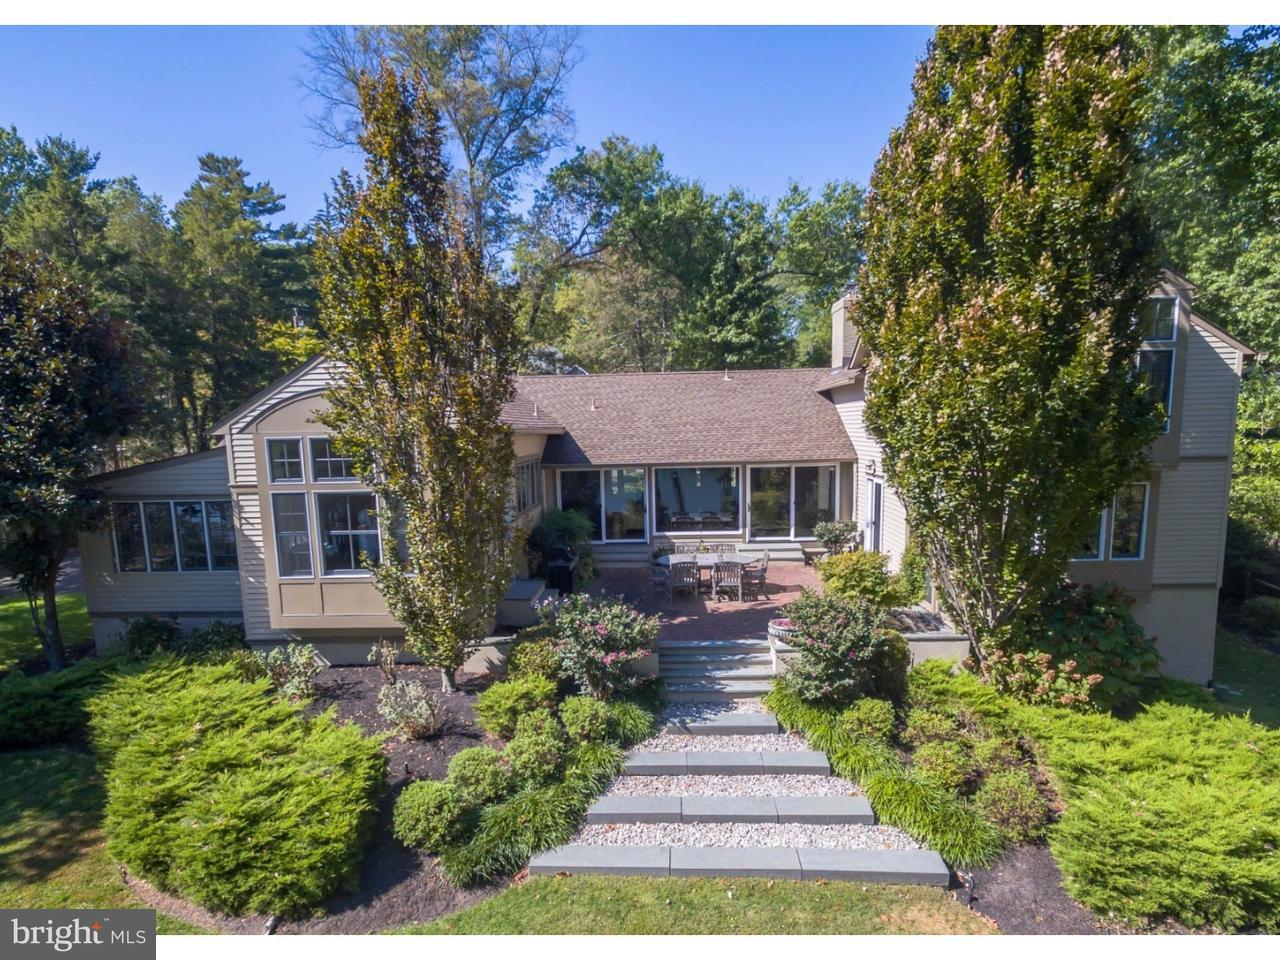 Single Family Home for Sale at 551 LAKE Drive Princeton, New Jersey 08540 United StatesMunicipality: Princeton